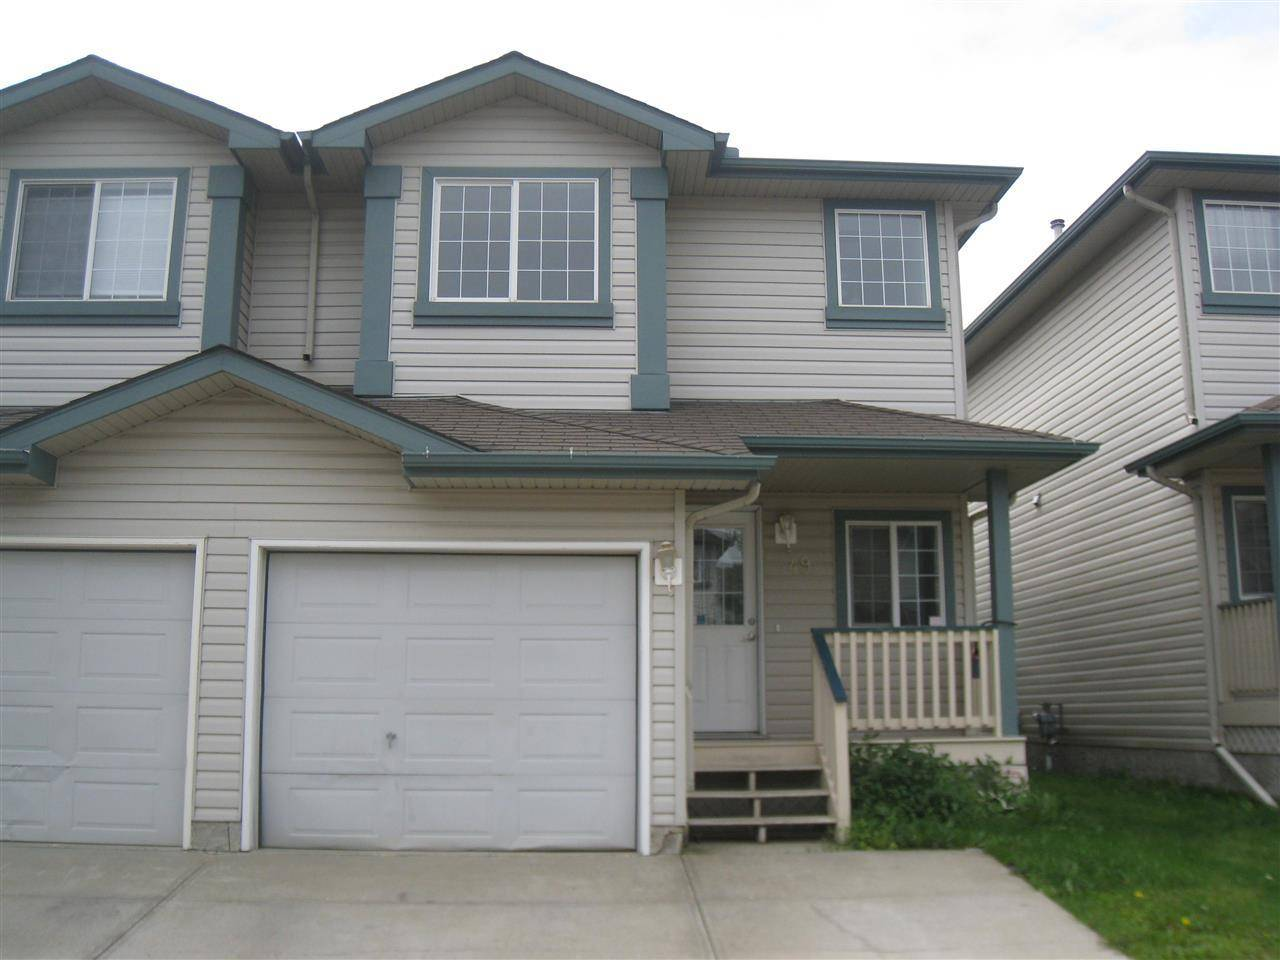 Townhouse for sale at 2004 Grantham Ct Nw Unit 49 Edmonton Alberta - MLS: E4172554